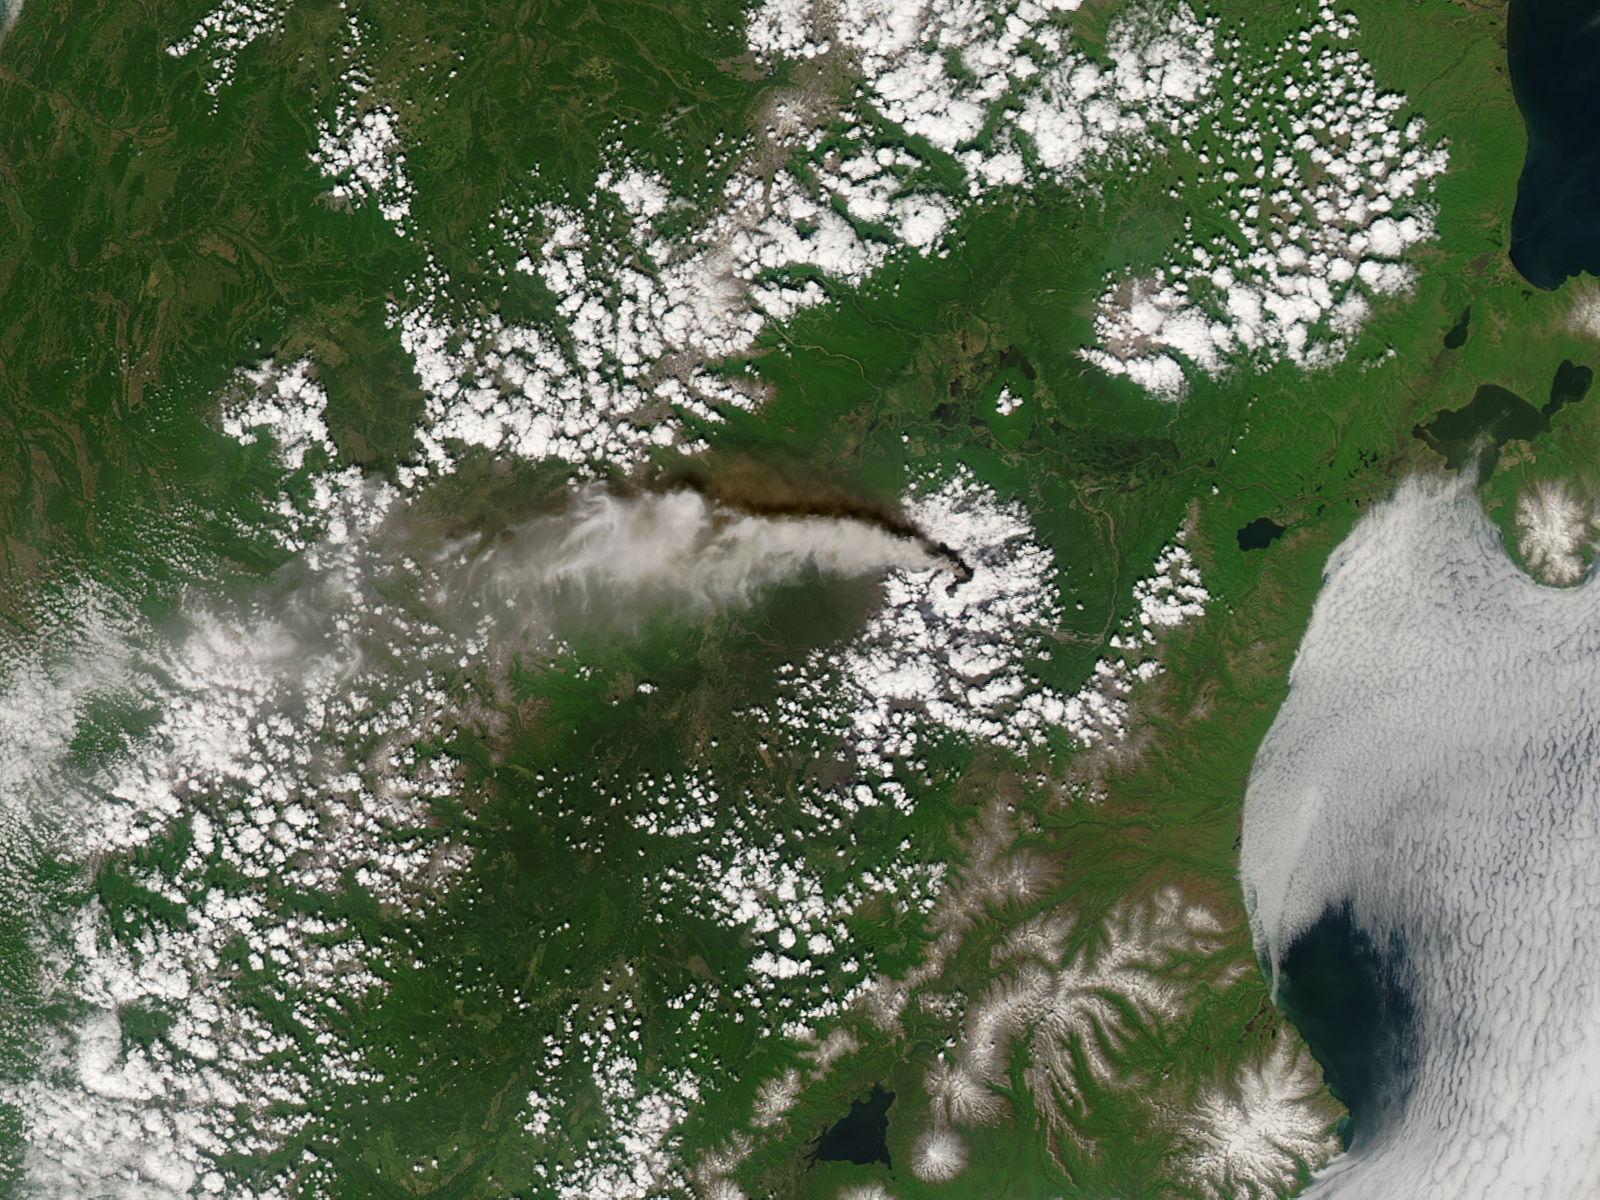 Plume from Kliuchevskoi volcano, Kamchatka Peninsula, Eastern Russia - related image preview